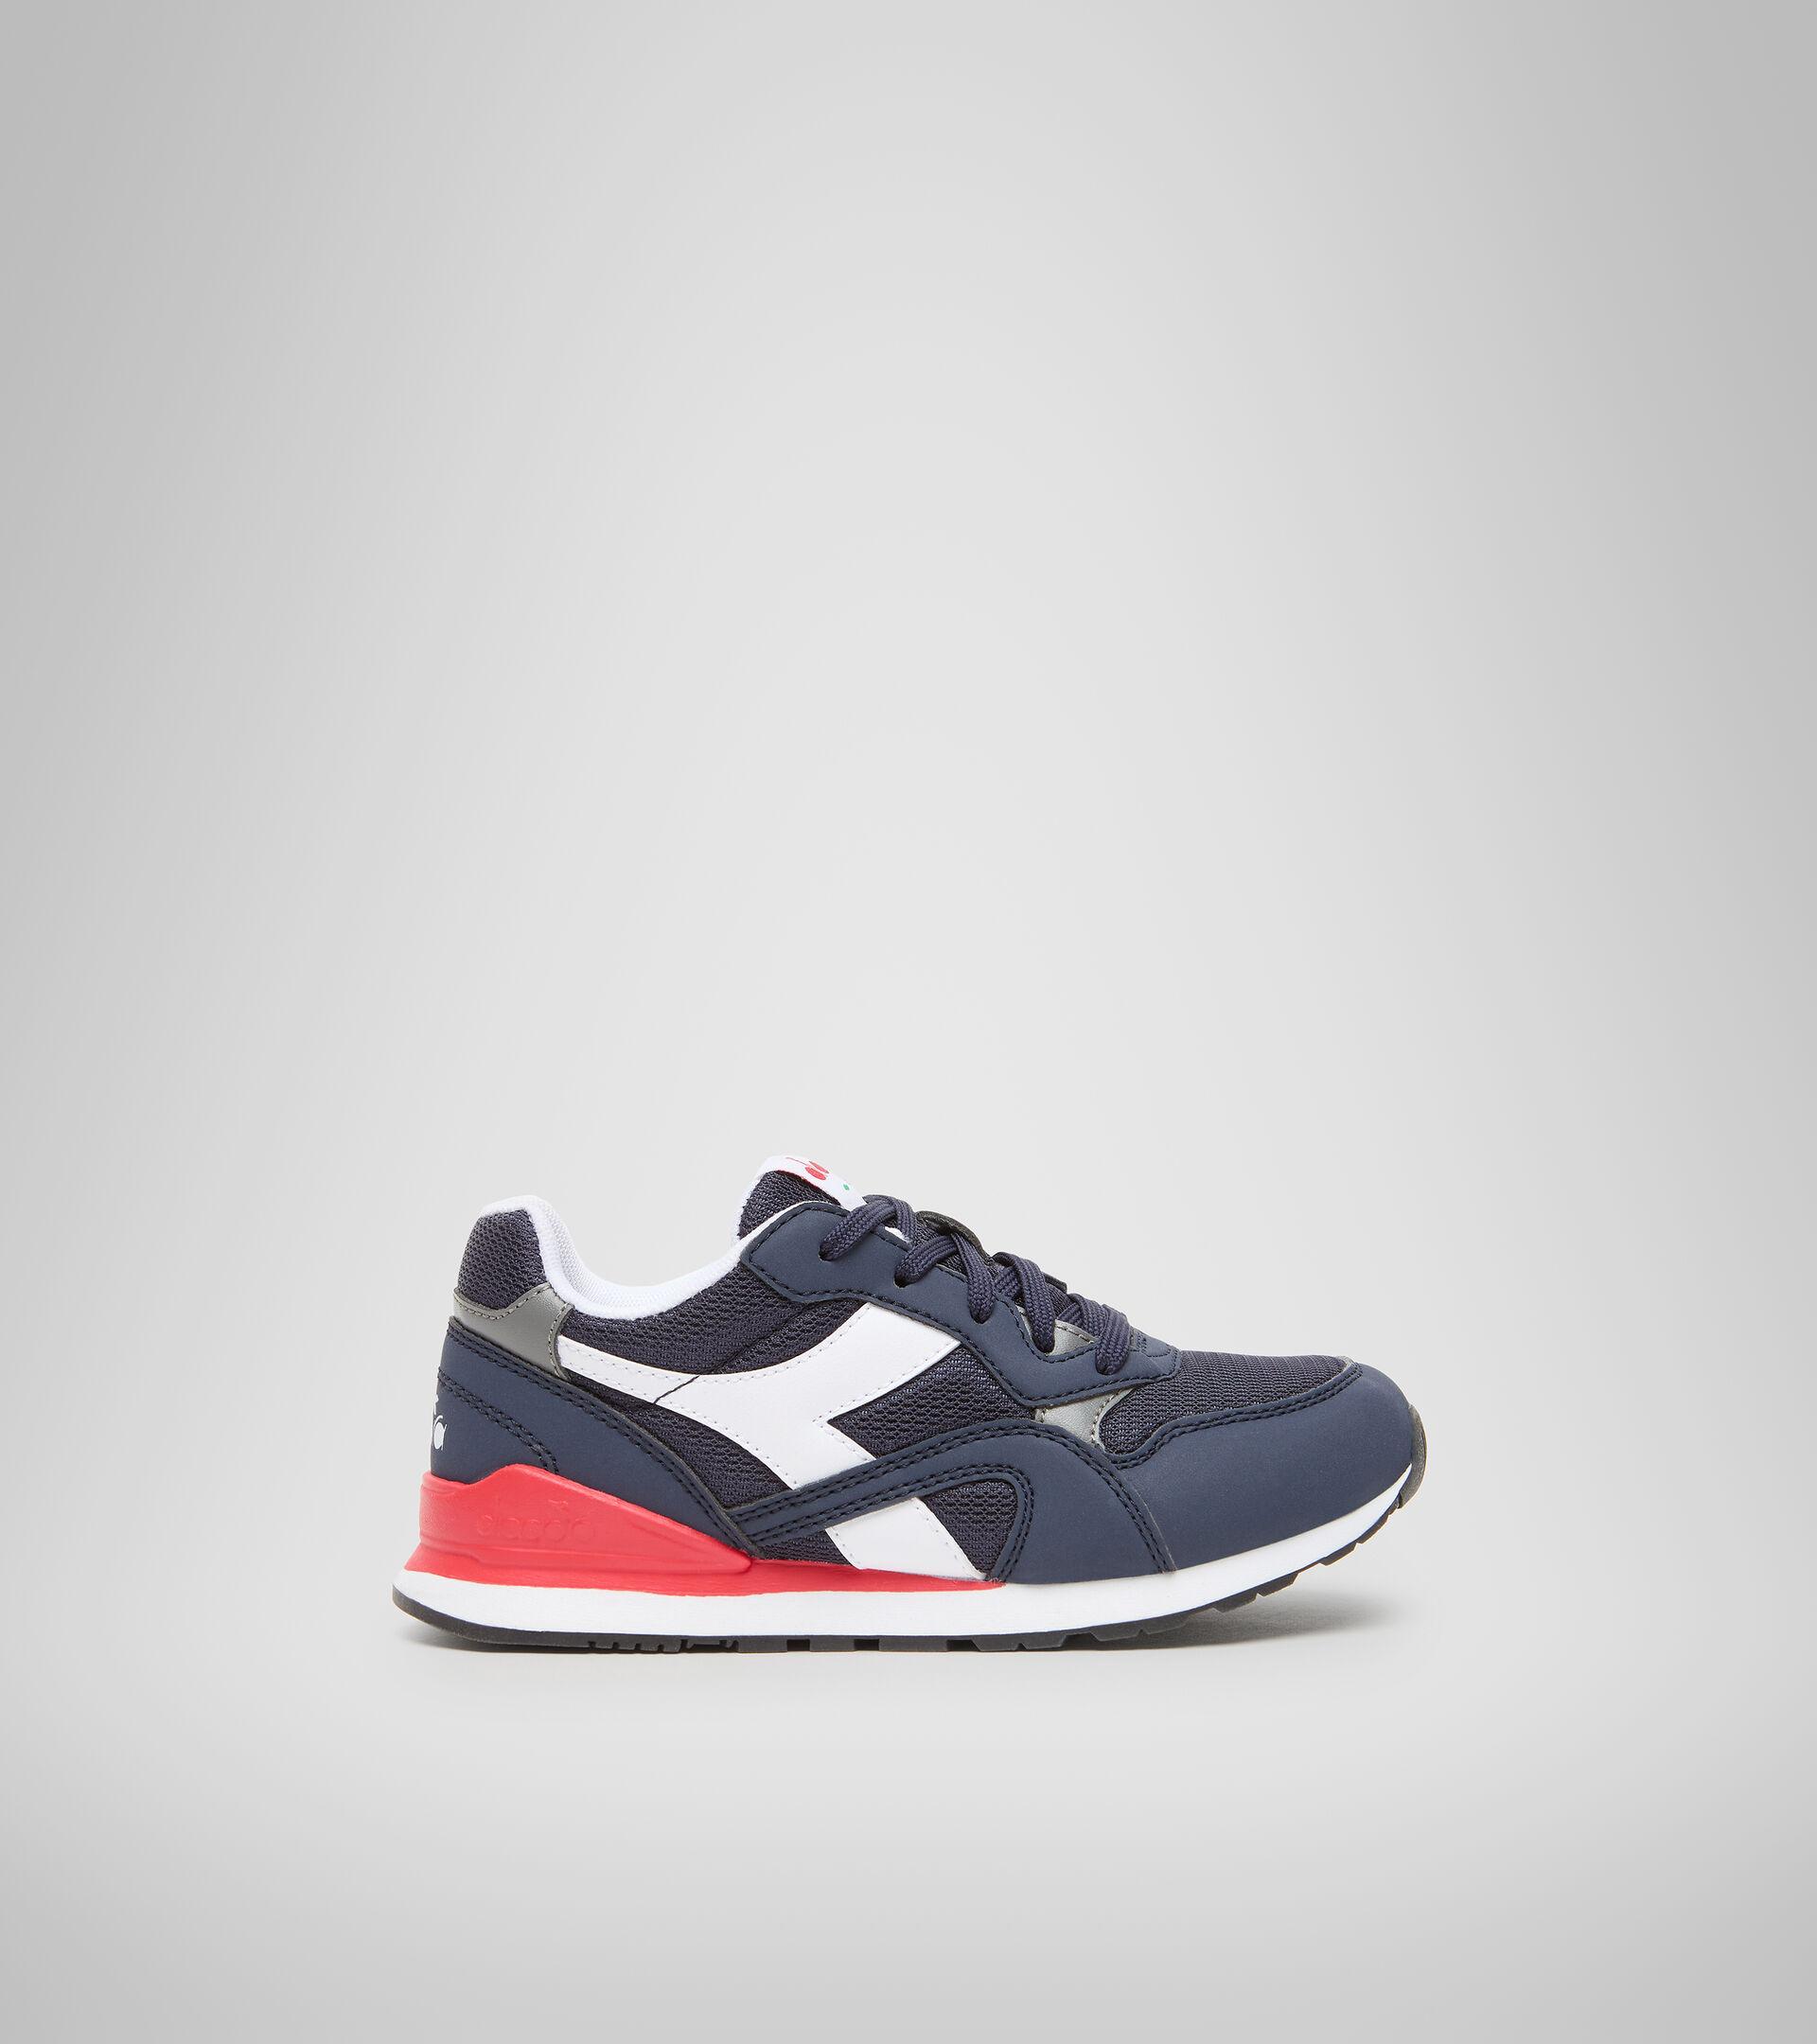 Chaussures de sport - Enfants 4-8 ans N.92 PS BLEU CORSAIRE - Diadora